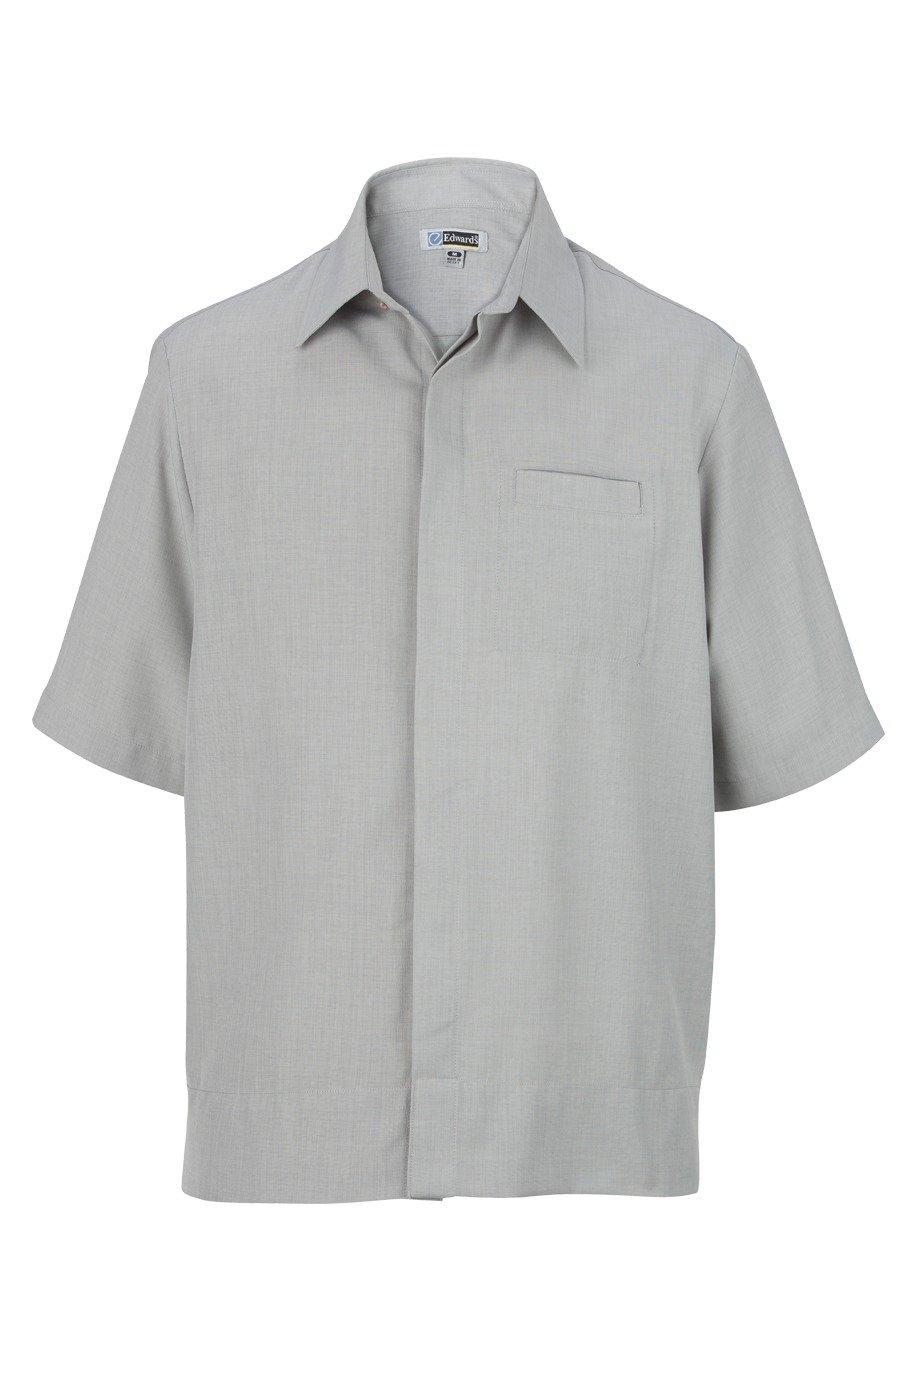 Edwards-Elliesox Elliesox Batiste Service Shirt 5XLT Platinum 1031 by Edwards-Elliesox